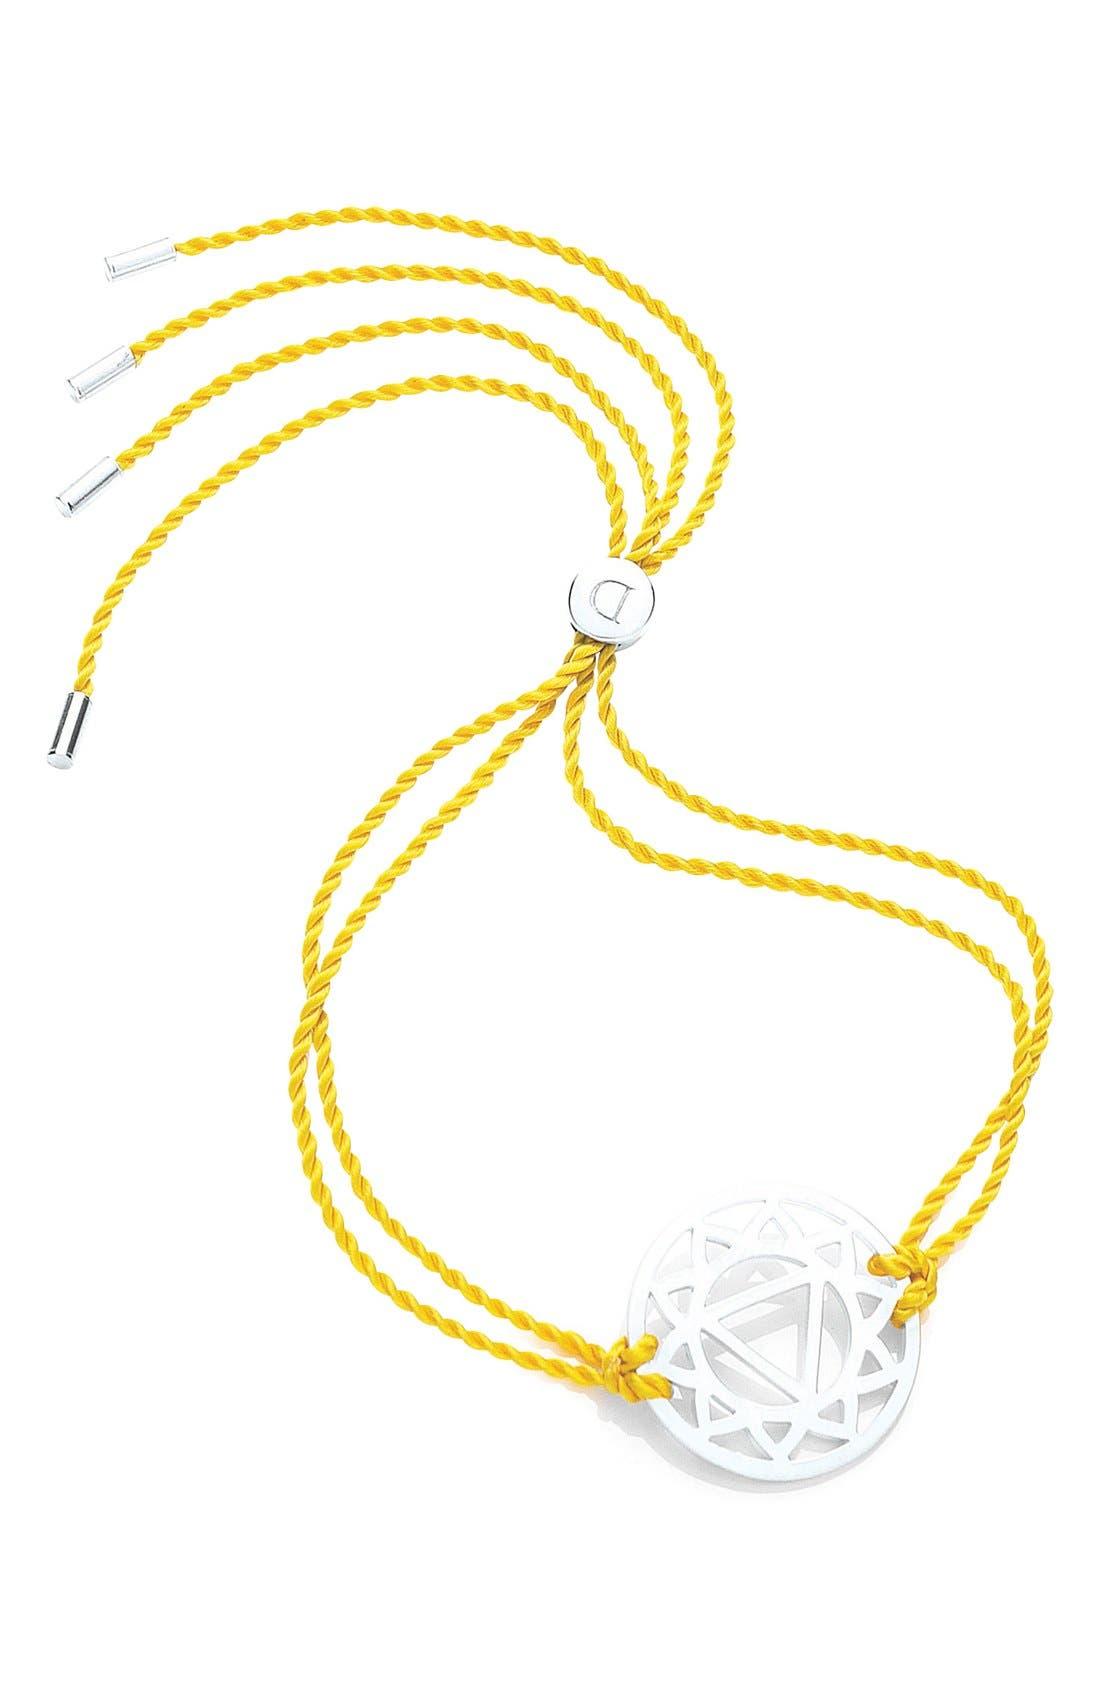 Alternate Image 1 Selected - Daisy London 'Solar Plexus Chakra' Cord Bracelet